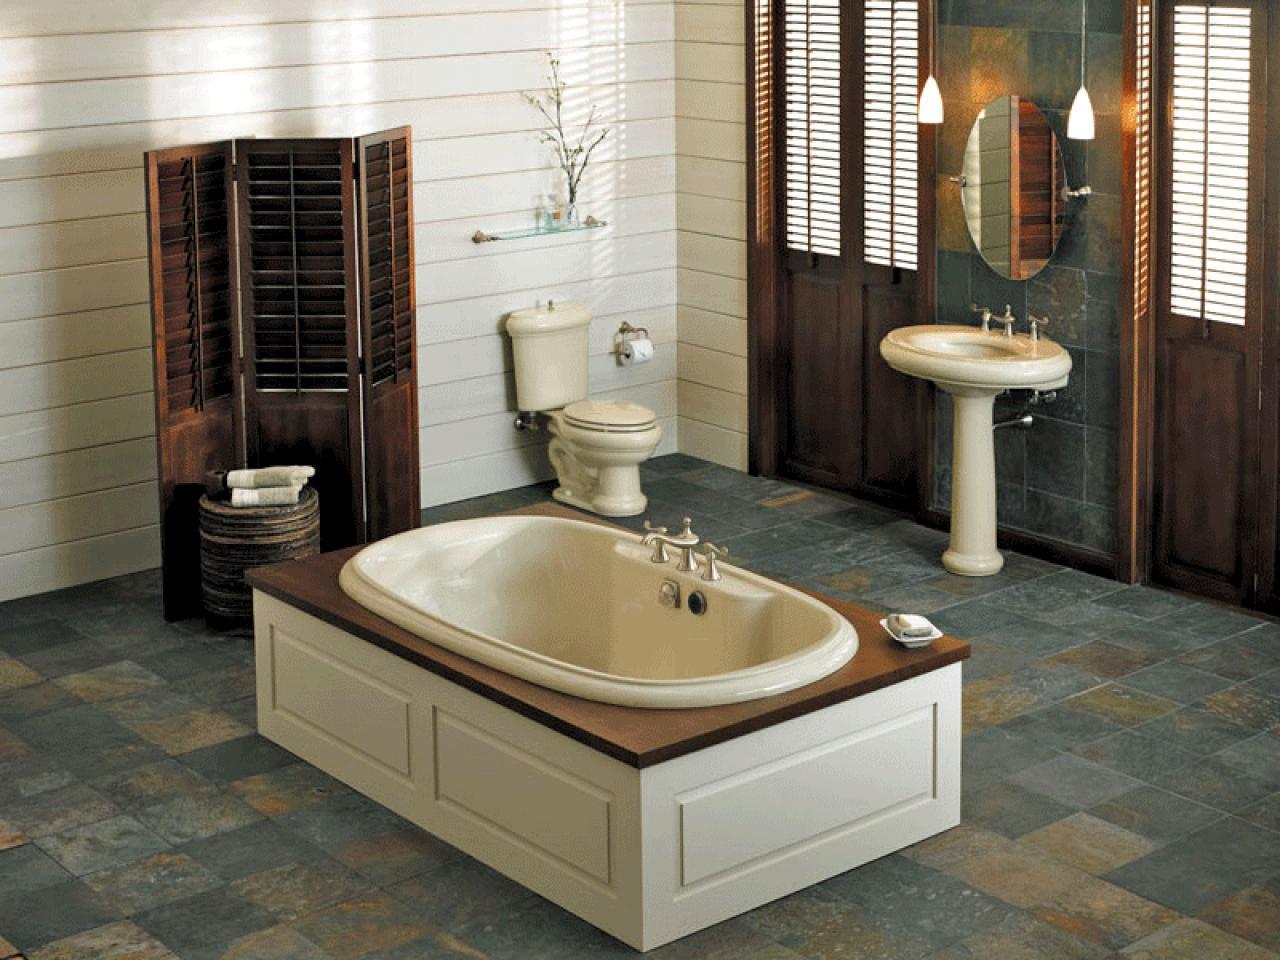 Combine Bathroom Colors with Confidence | HGTV